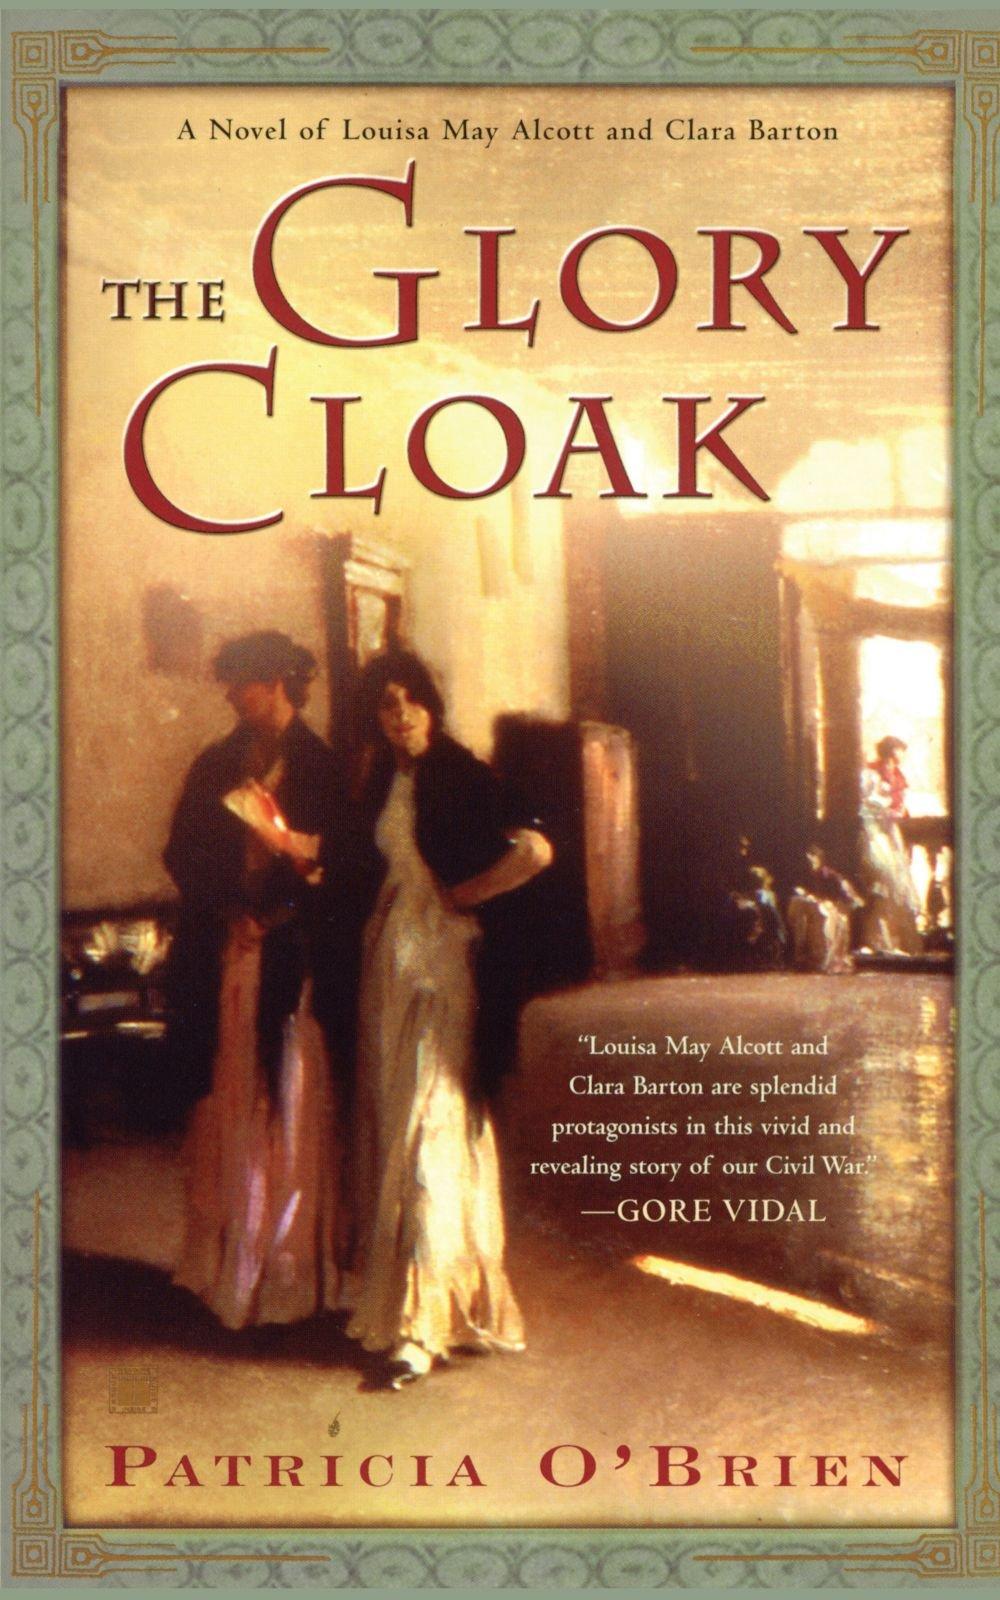 Download The Glory Cloak: A Novel of Louisa May Alcott and Clara Barton PDF